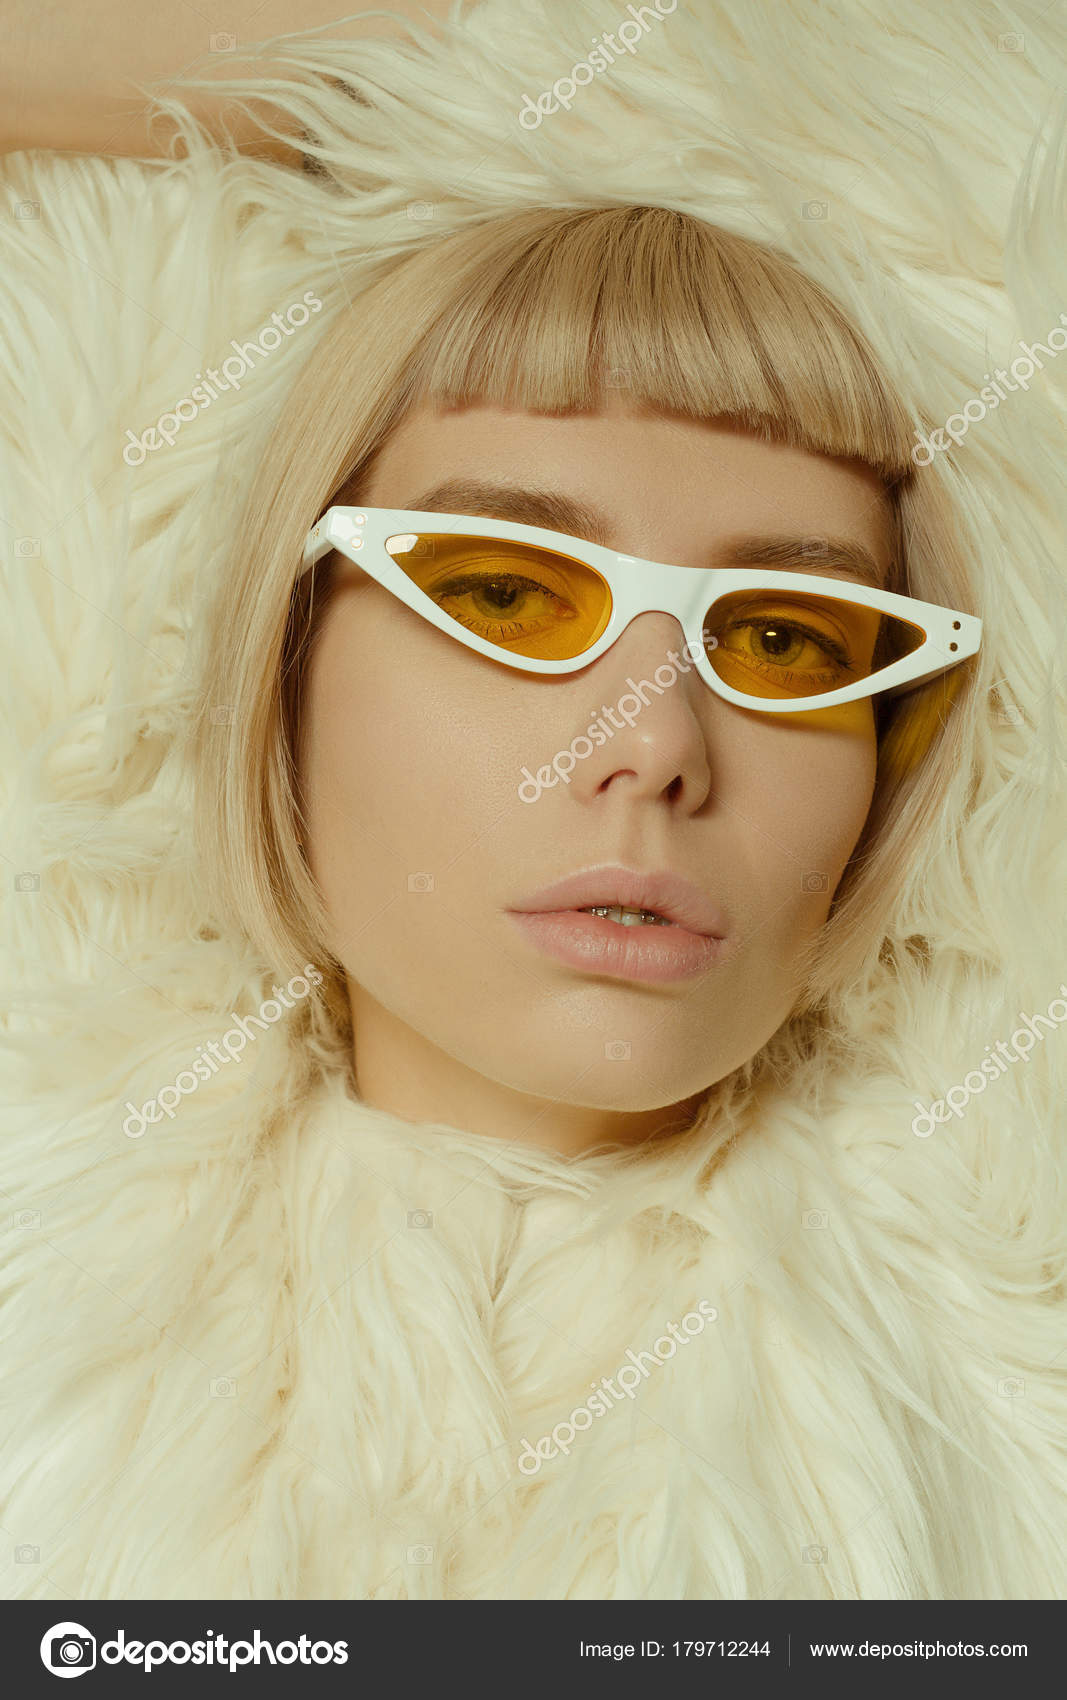 339f1d7318322 Loira Com Cabelo Curto Estilo Óculos Moda — Fotografia de Stock